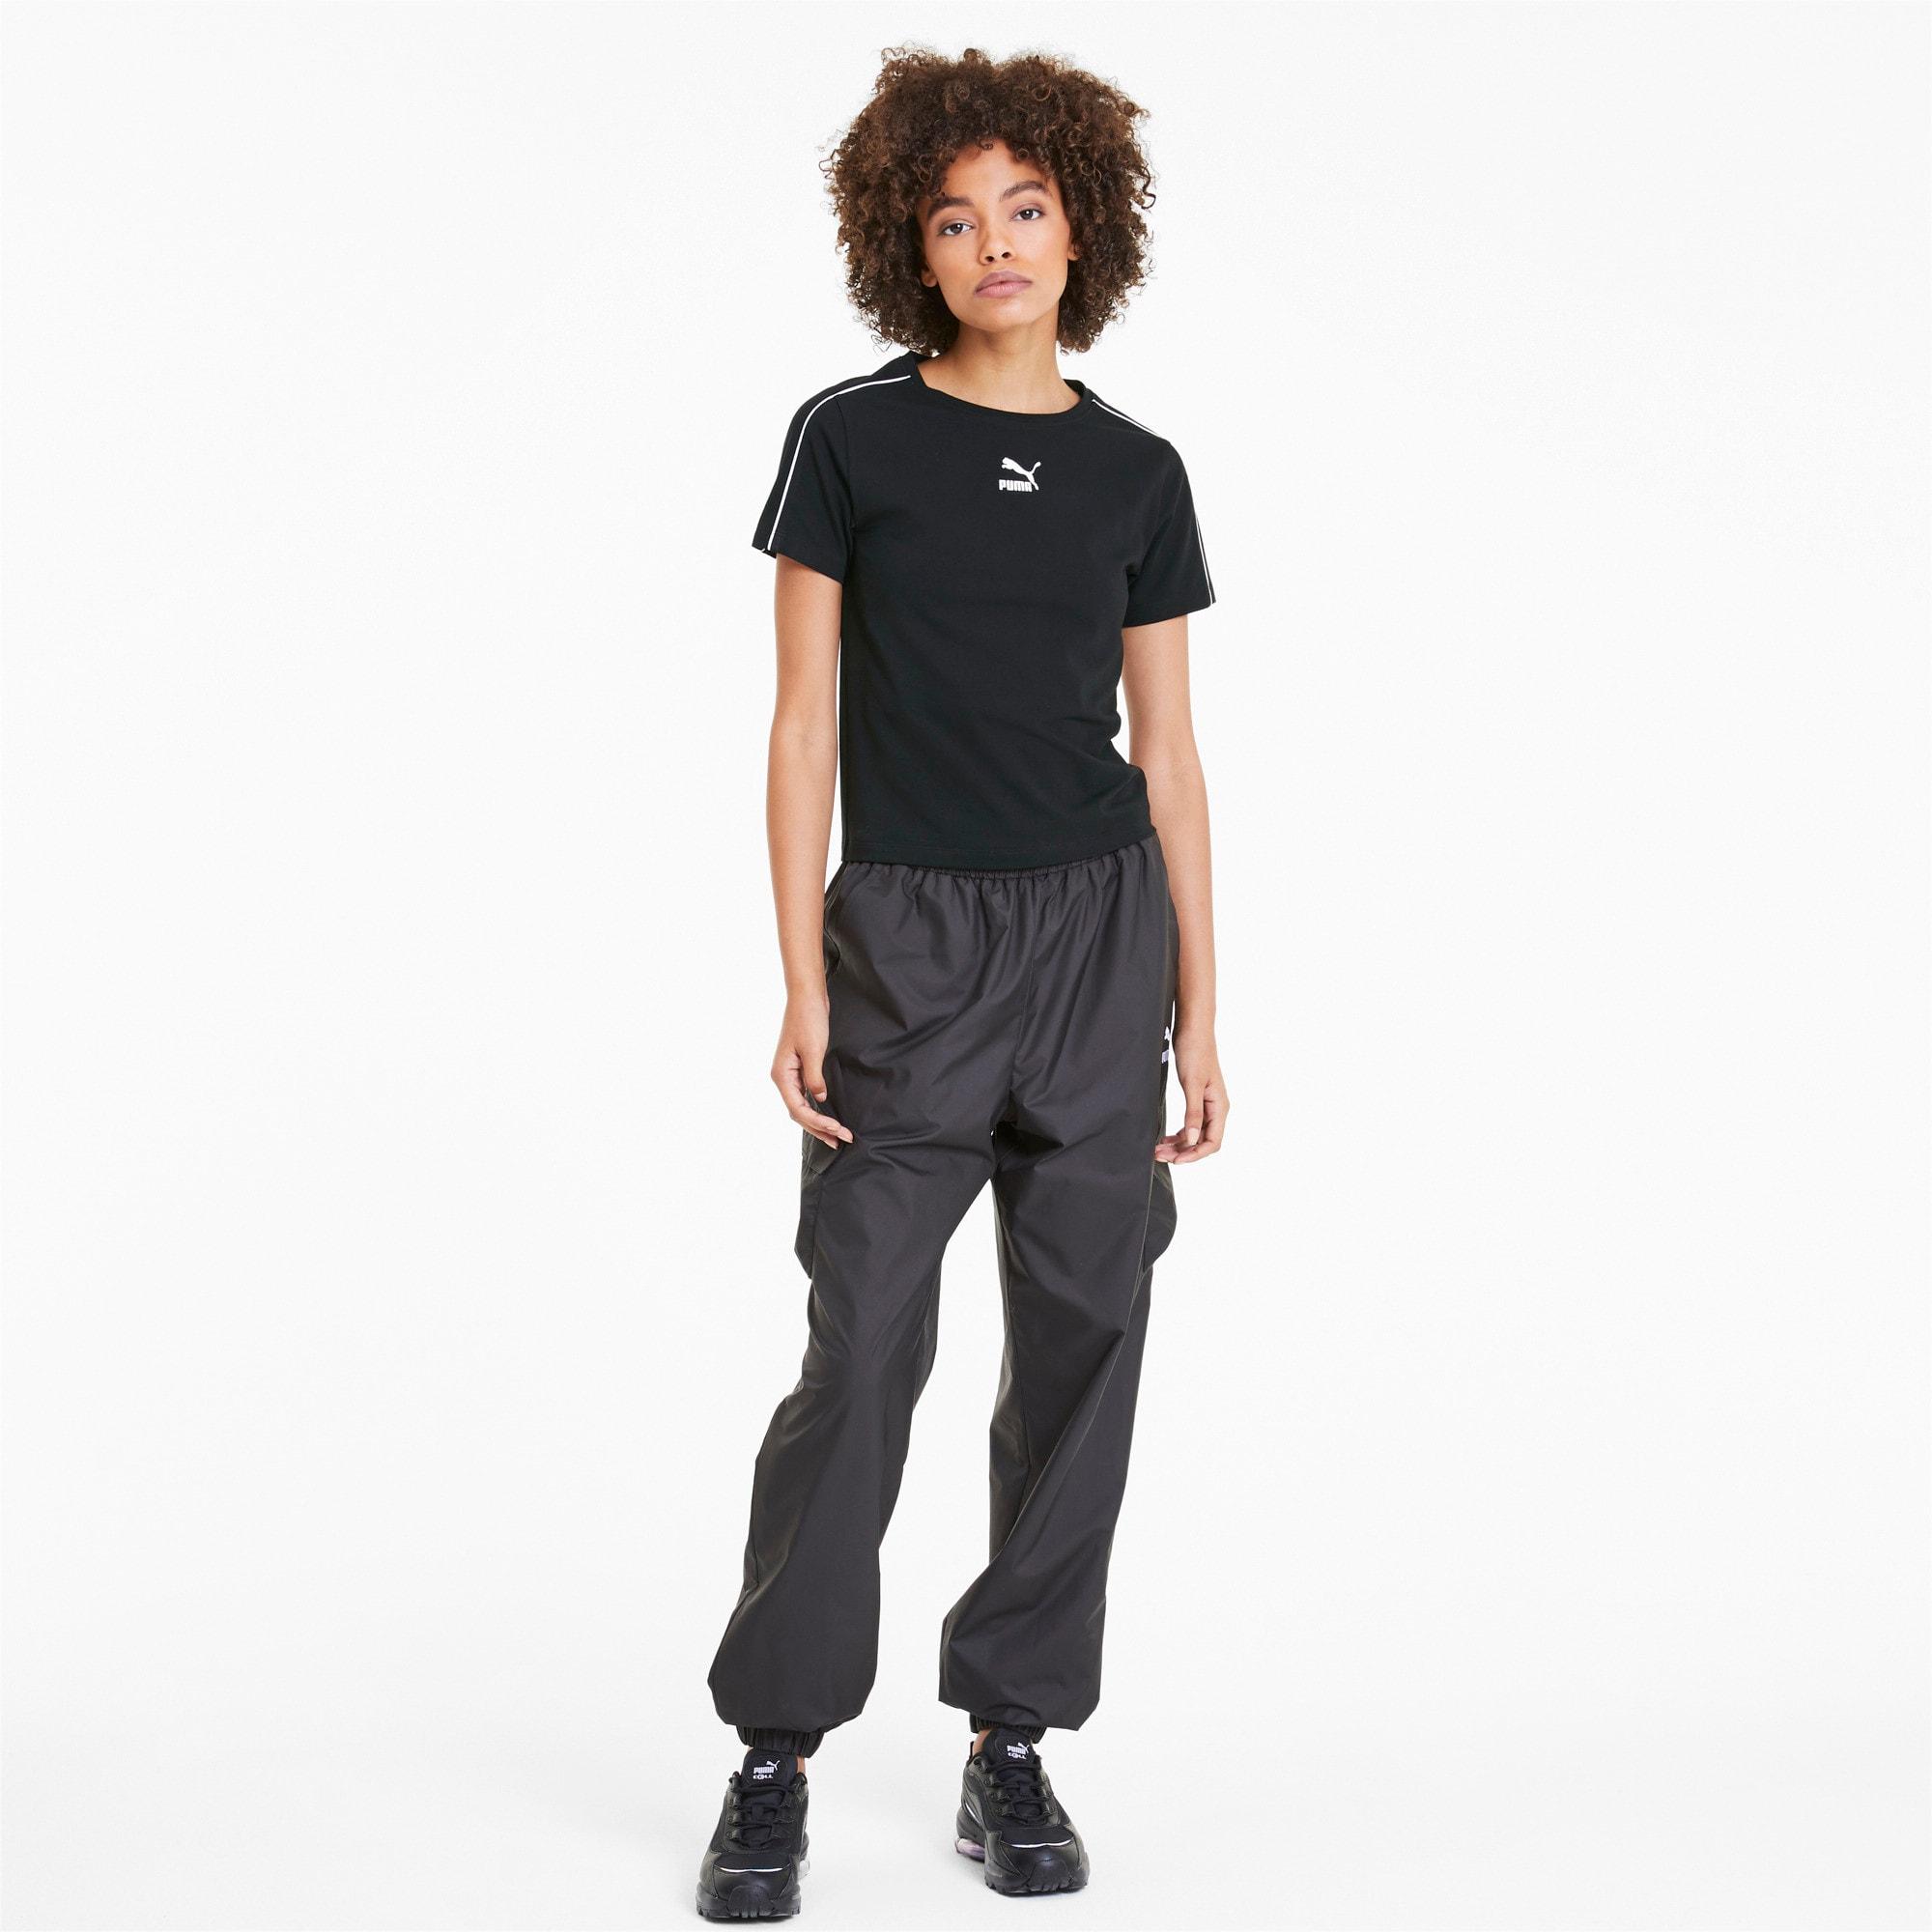 Miniatura 3 de Camiseta Classics Tight para mujer, Puma Black, mediano